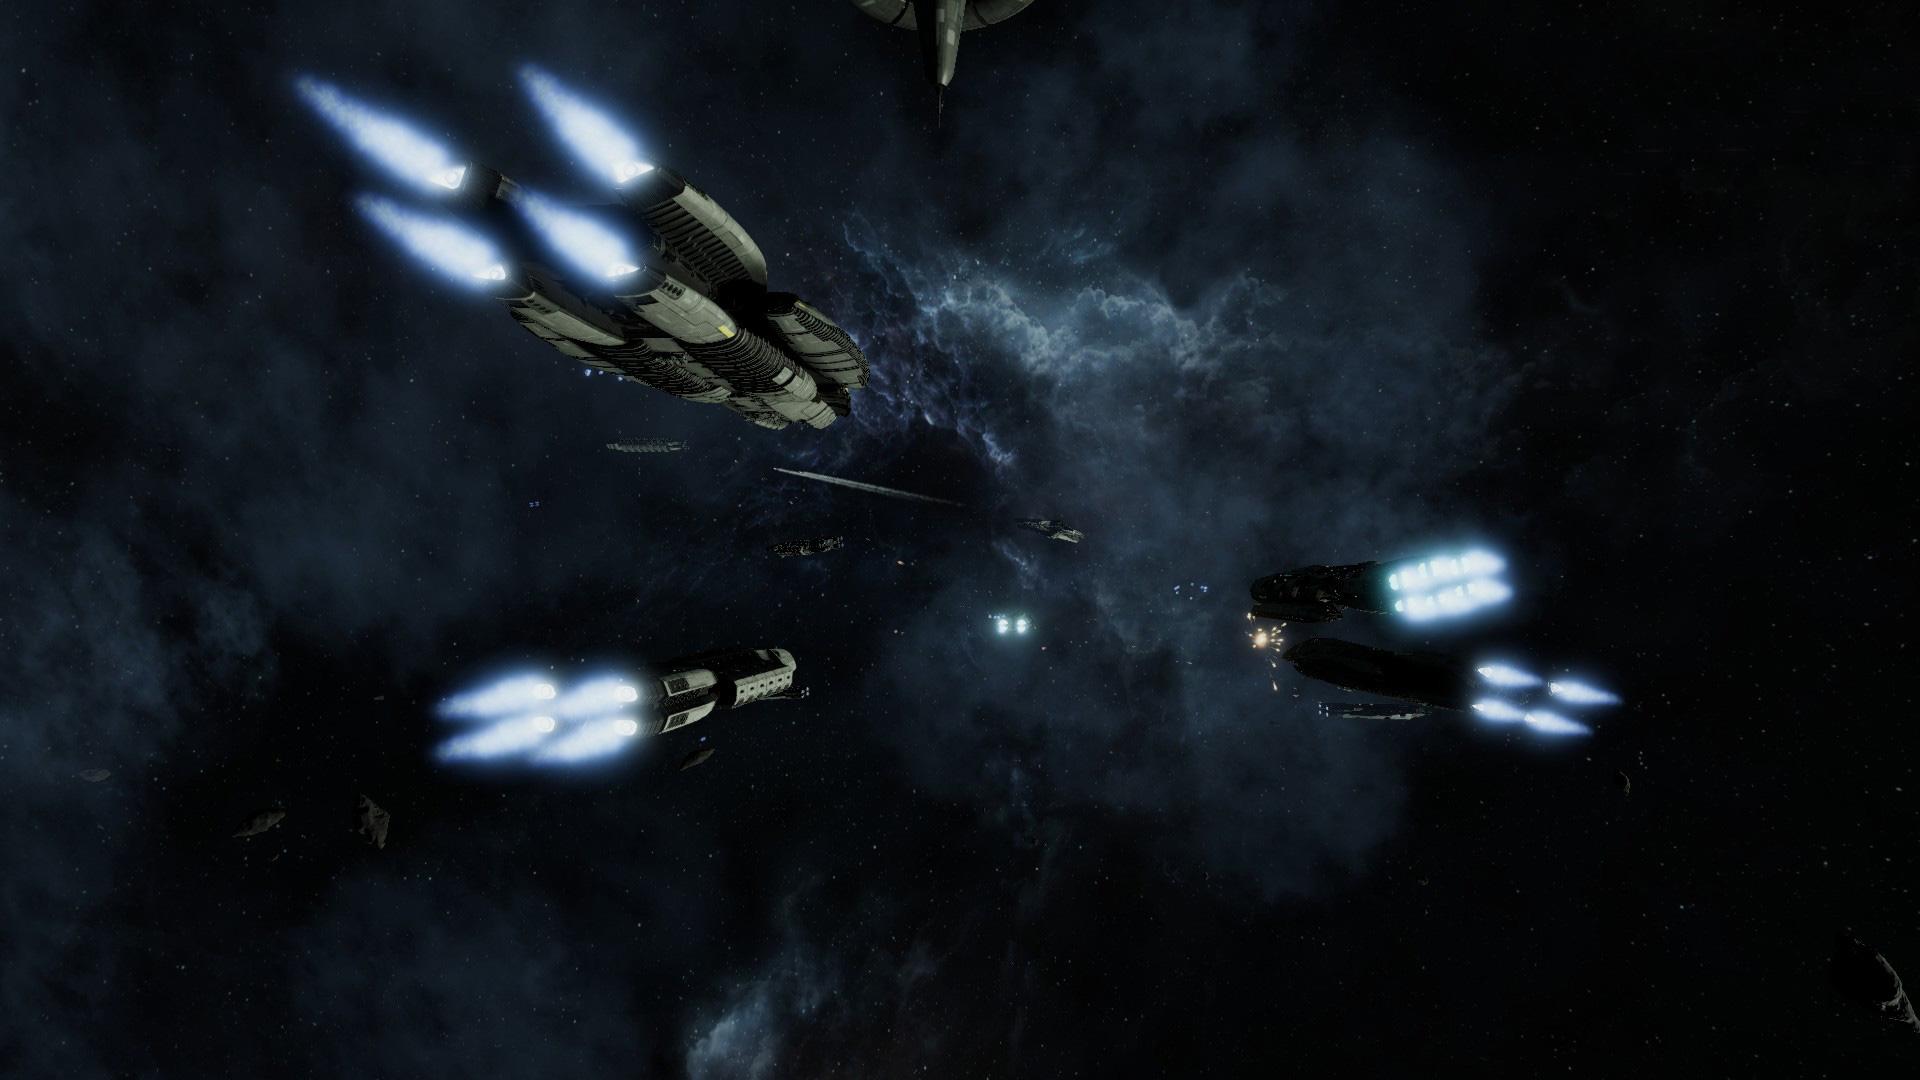 BattlestarGalacticaDeadlock Multi Editeur 002